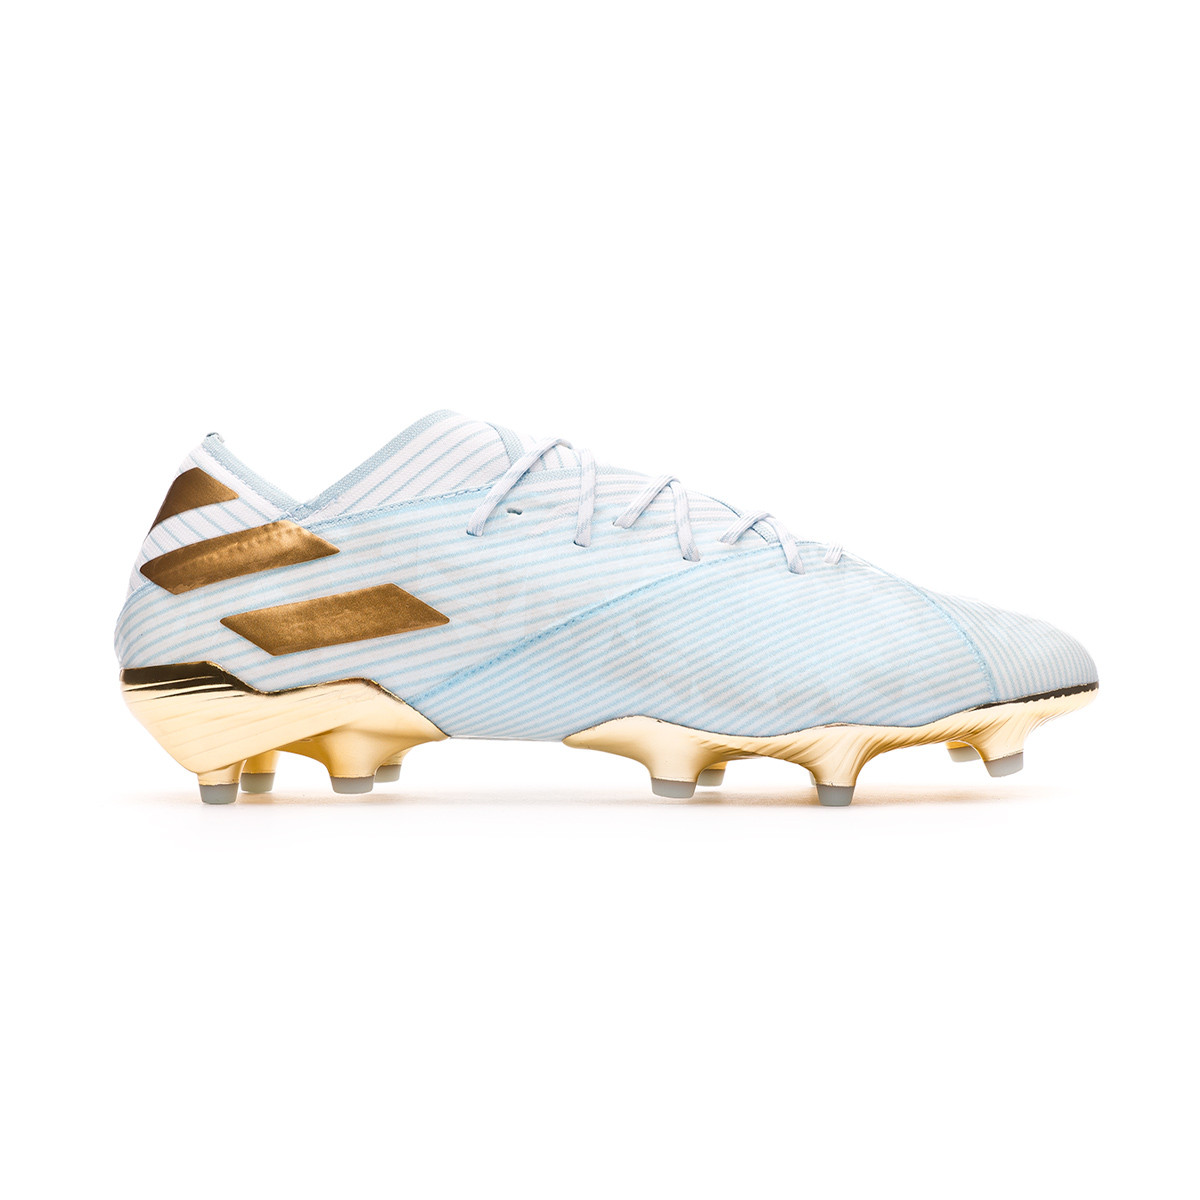 Chaussure de foot adidas Nemeziz Messi 19.1 FG 15 Years